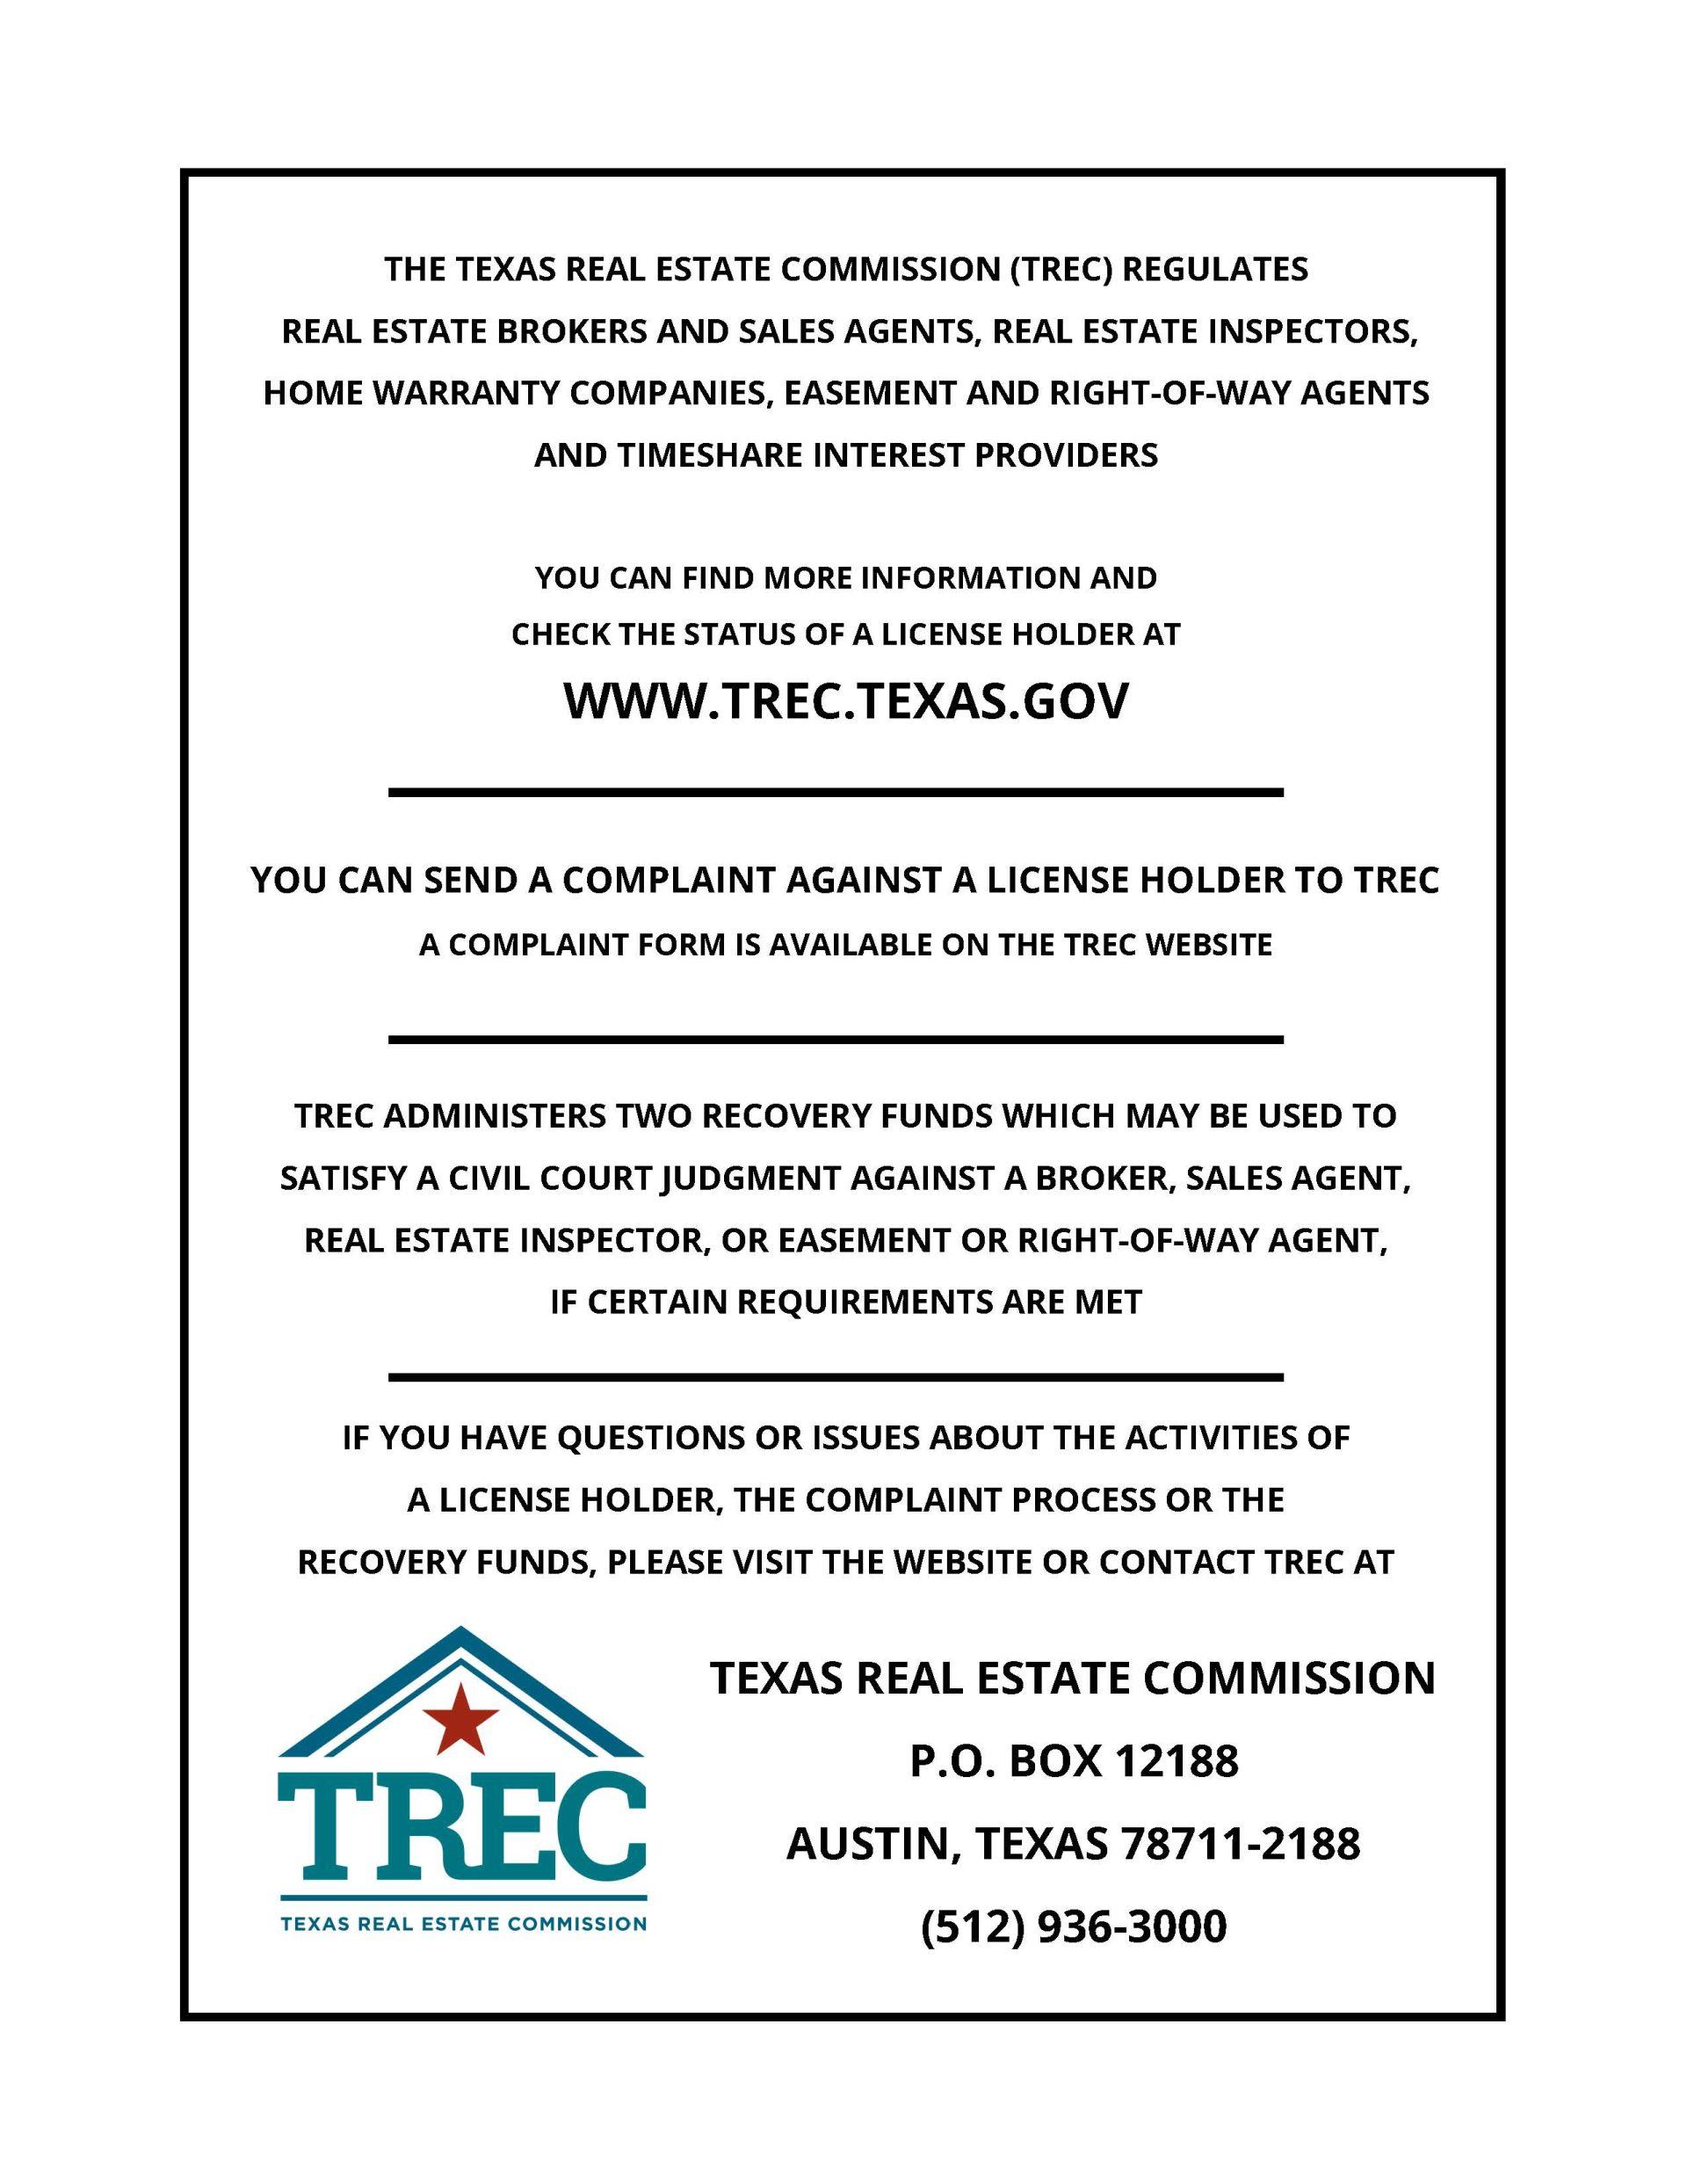 TREC Consumer Protection Notice